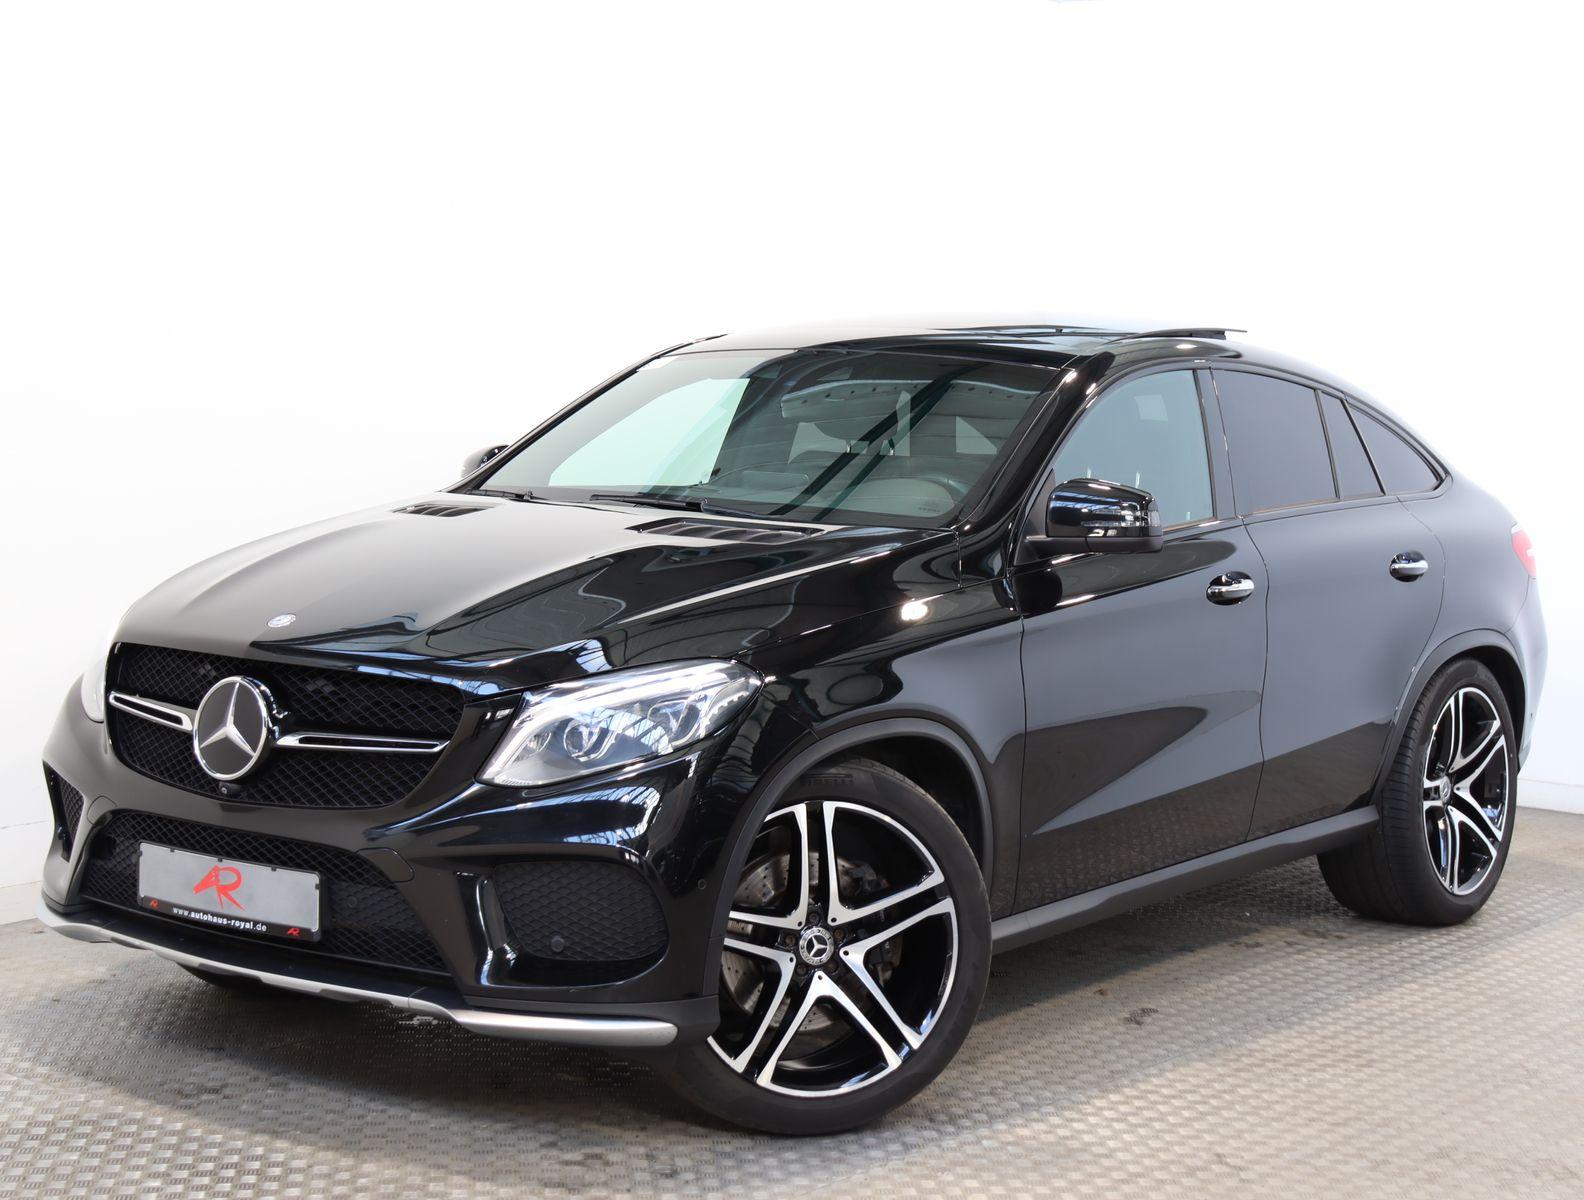 Mercedes-Benz GLE 43 AMG Coupe AIRMATIC,DISTRONIC,360GRAD,22Z., Jahr 2016, Benzin